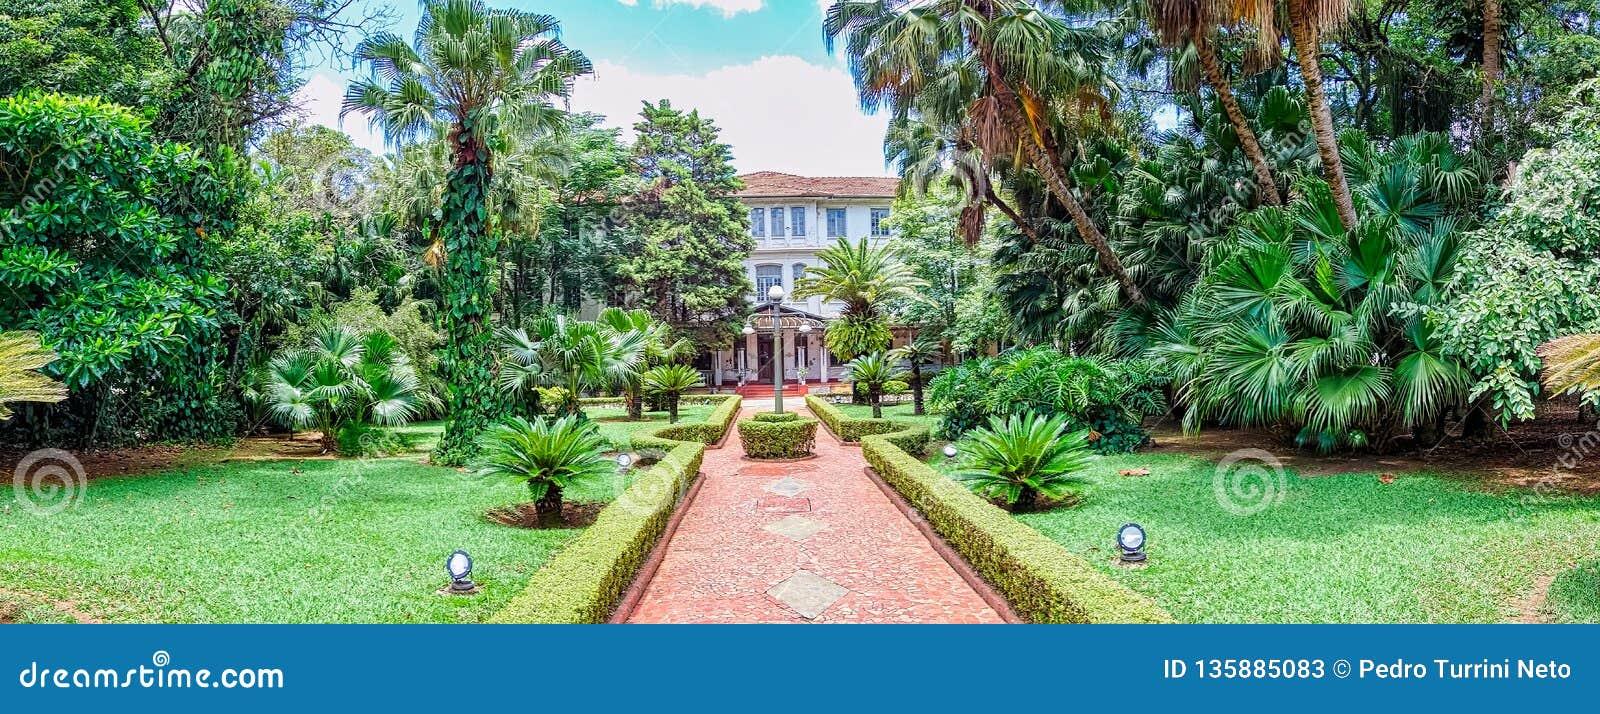 SAO JOSE DOS CAMPOS, SAO PAULO, BRÉSIL - 27 DÉCEMBRE 2018 : Bâtiment principal de parc de Vicentina Aranha, ancien sanatorium